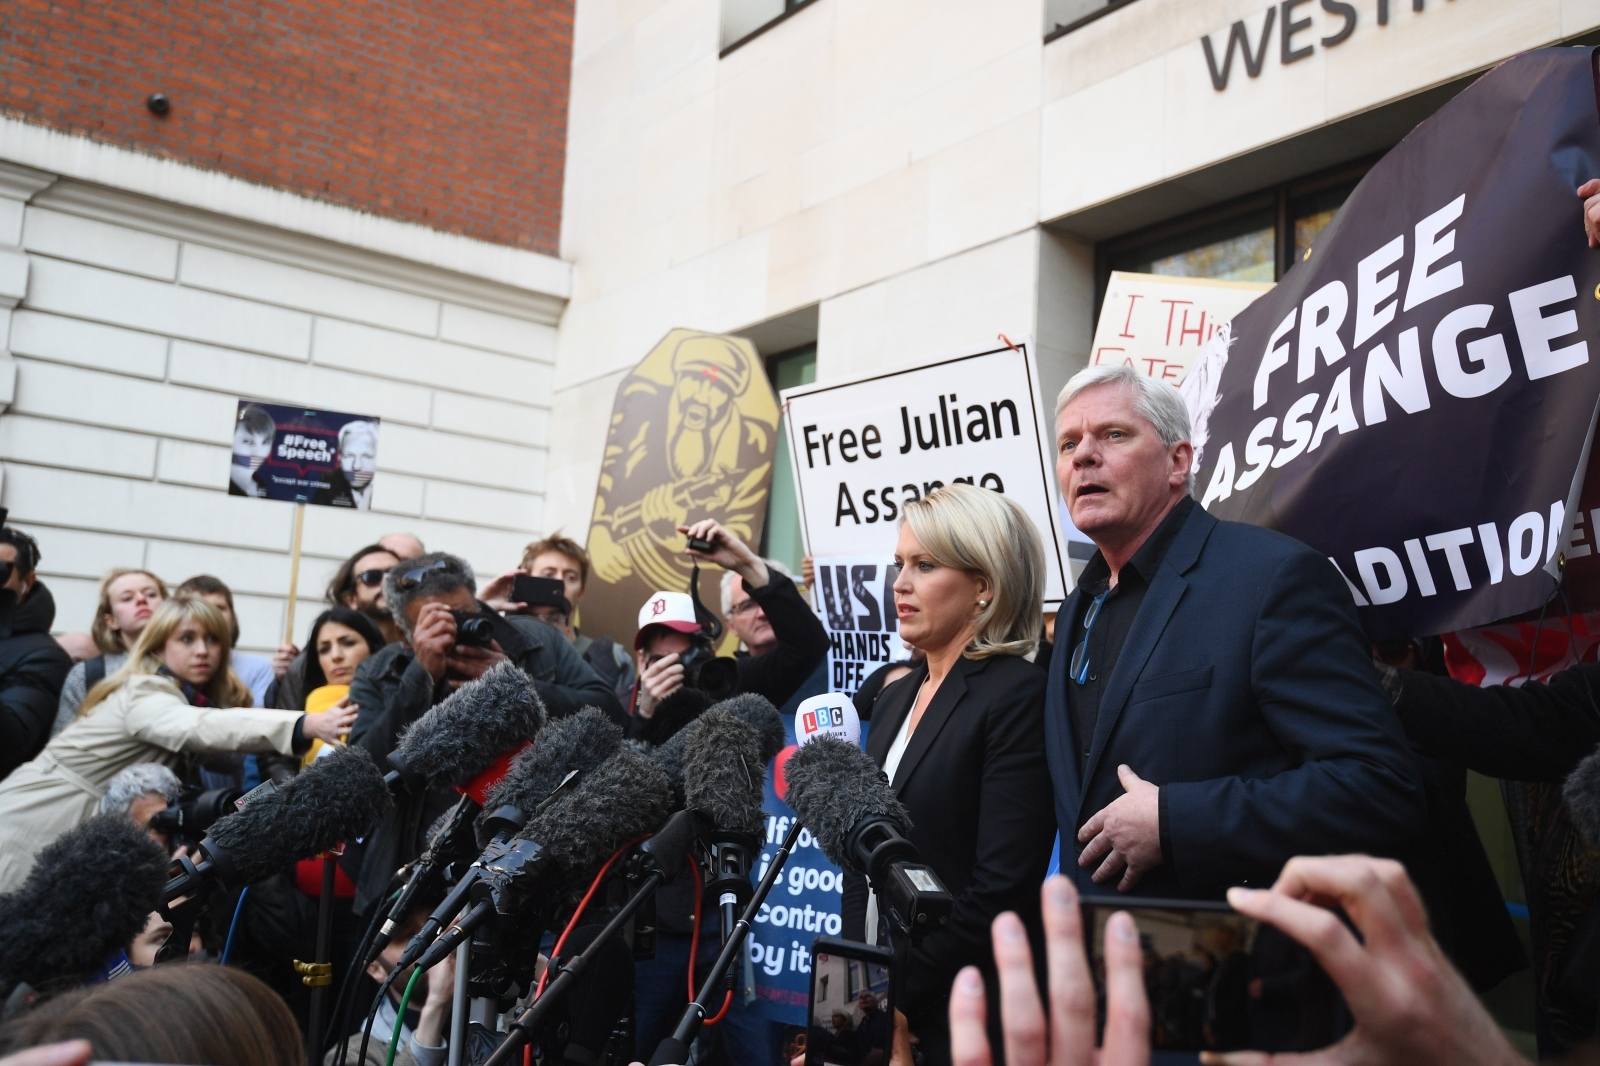 Julian Assange, aretacija Vir:Pixsell